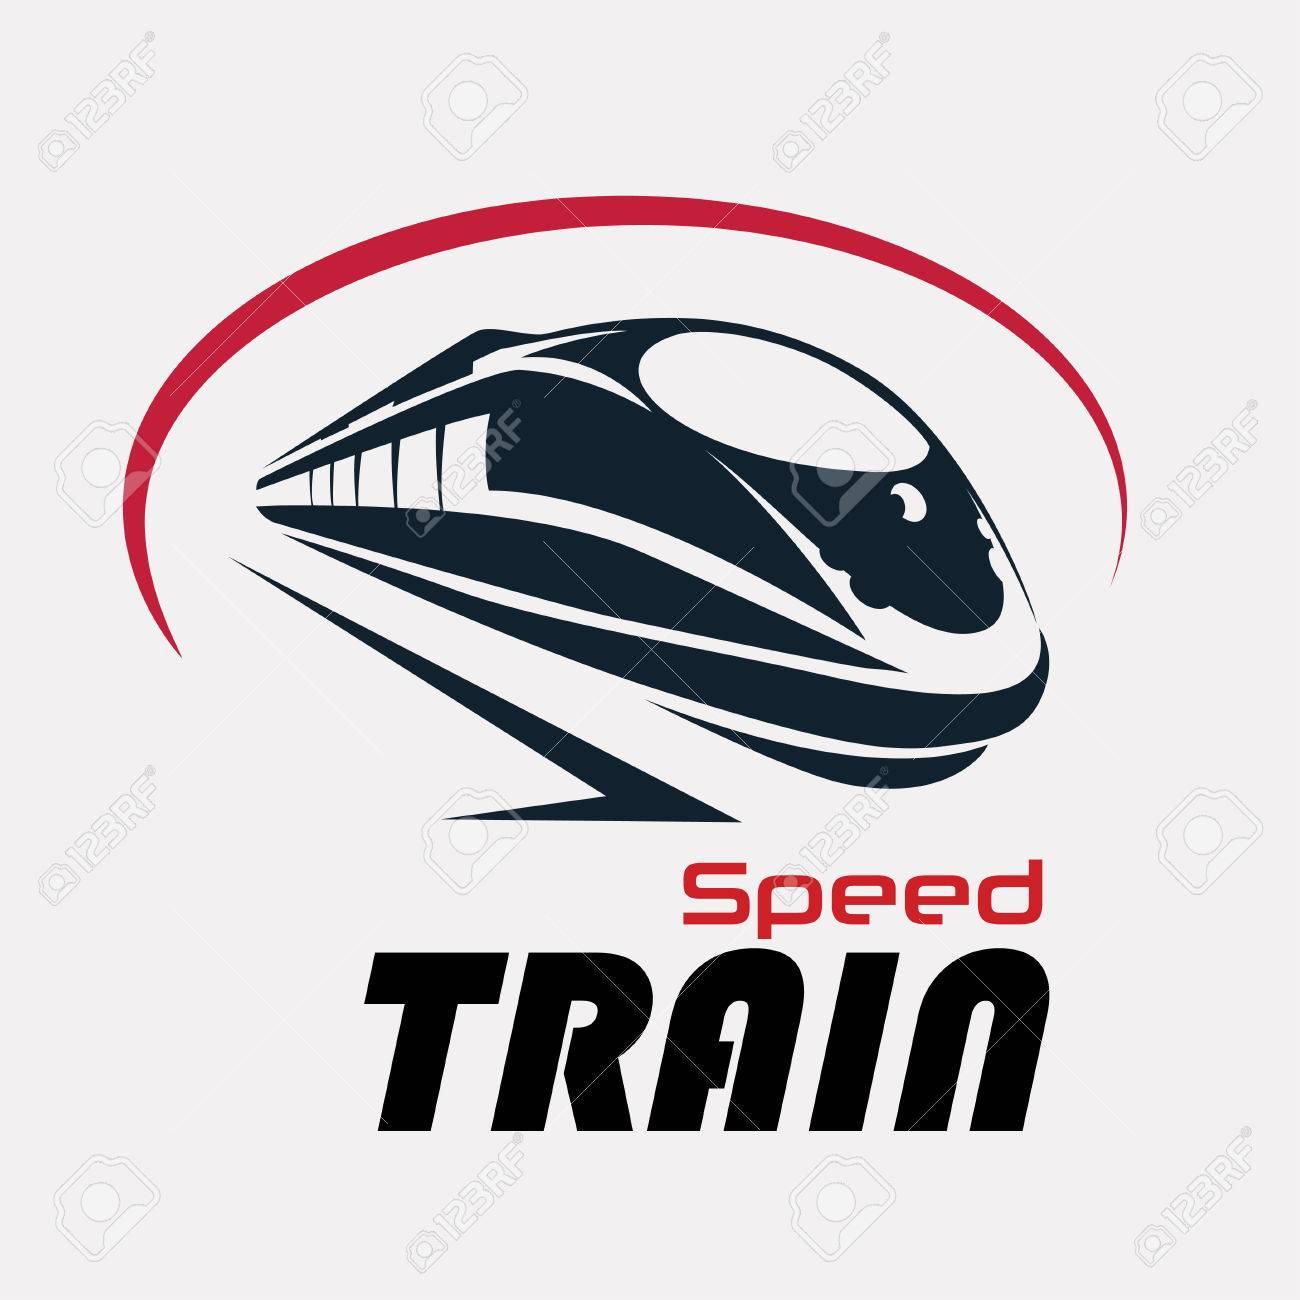 speed train logo template, stylized vector symbol - 69262446